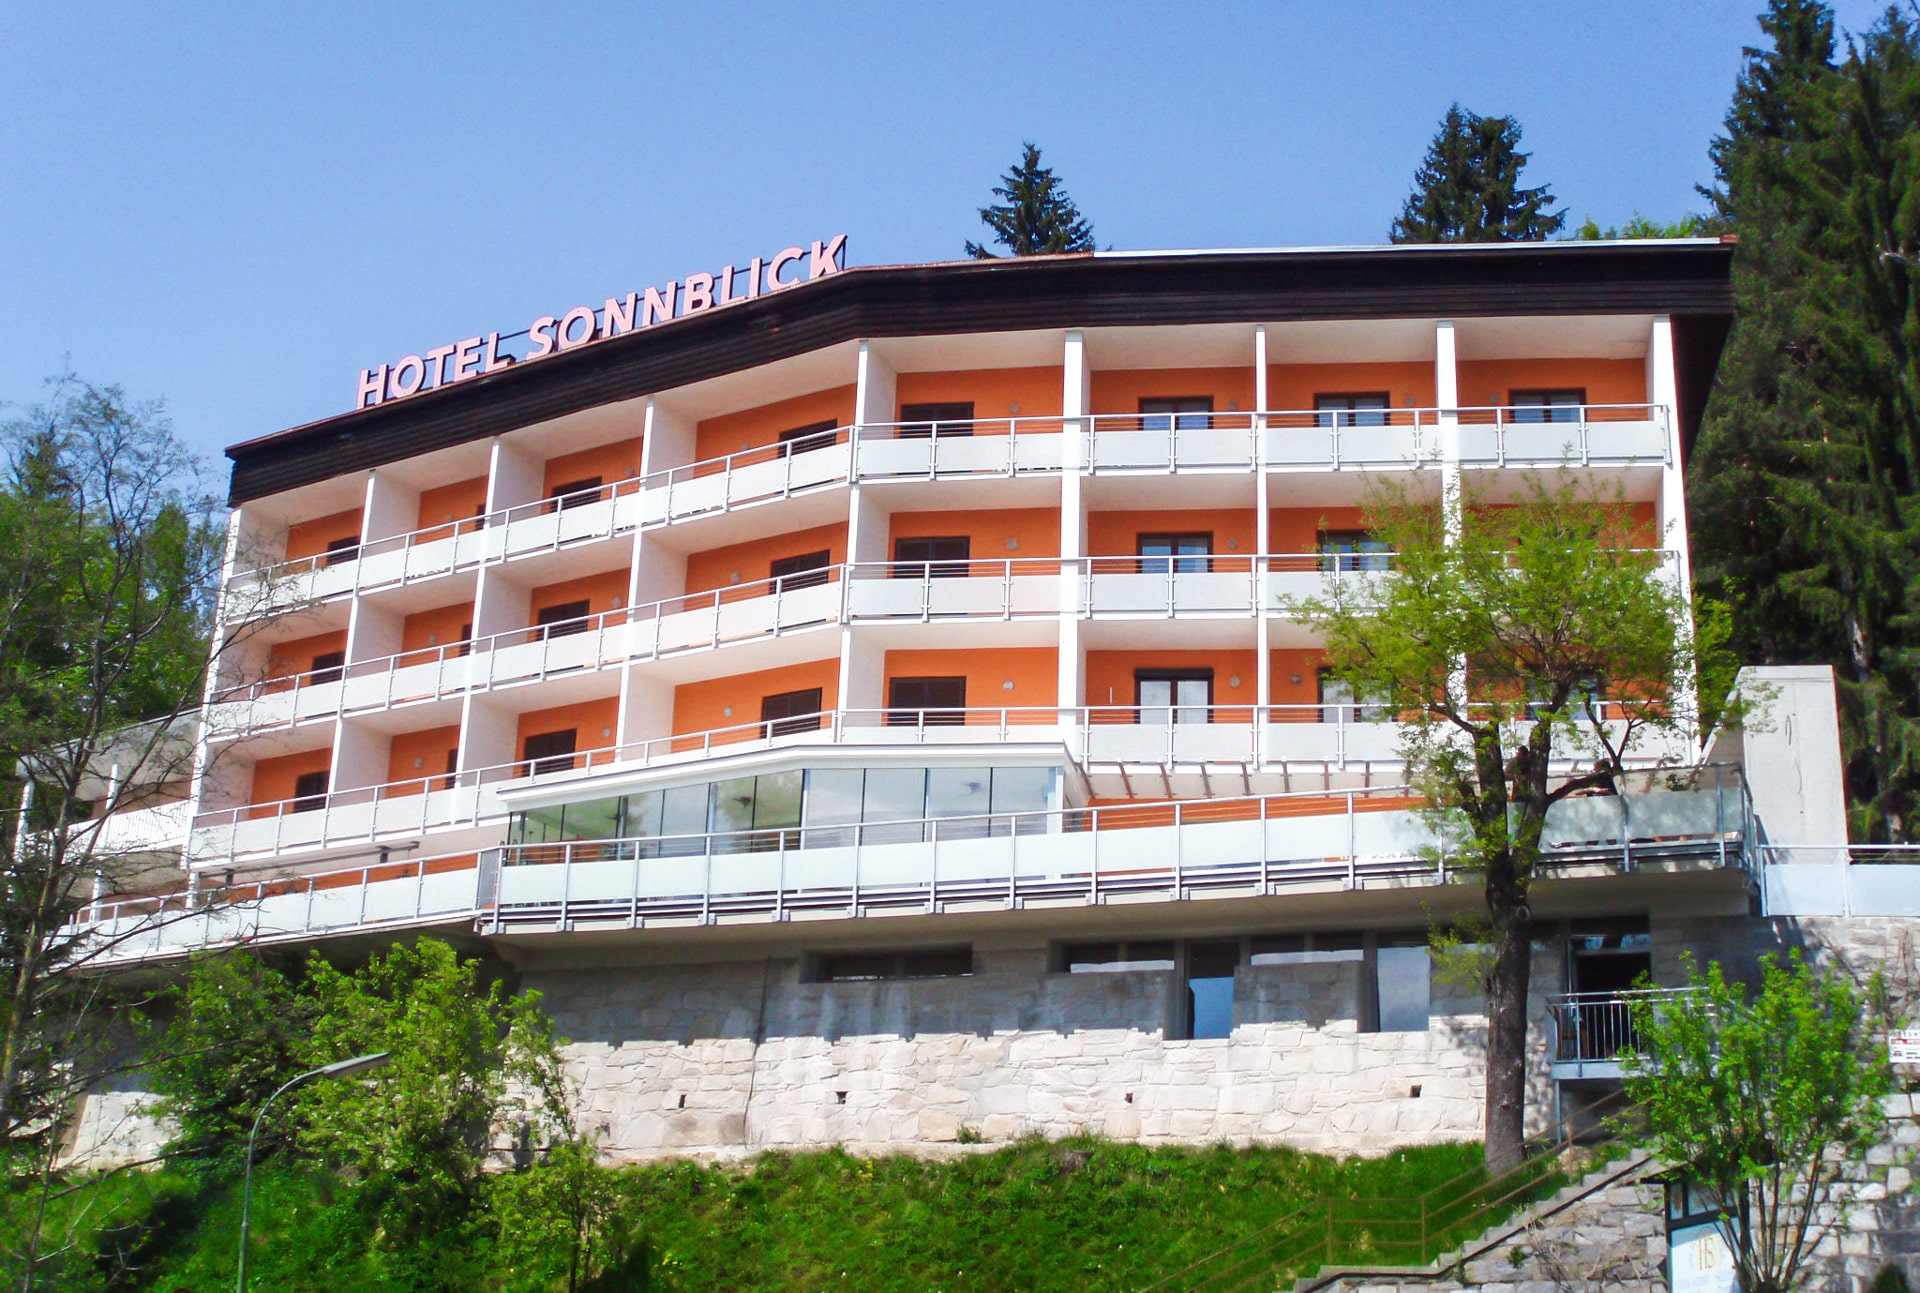 Mödling 01 a | graues Alu-Mattglas Balkongeländer bei Hotelbalkonen Hotel Sonnblick | Svoboda